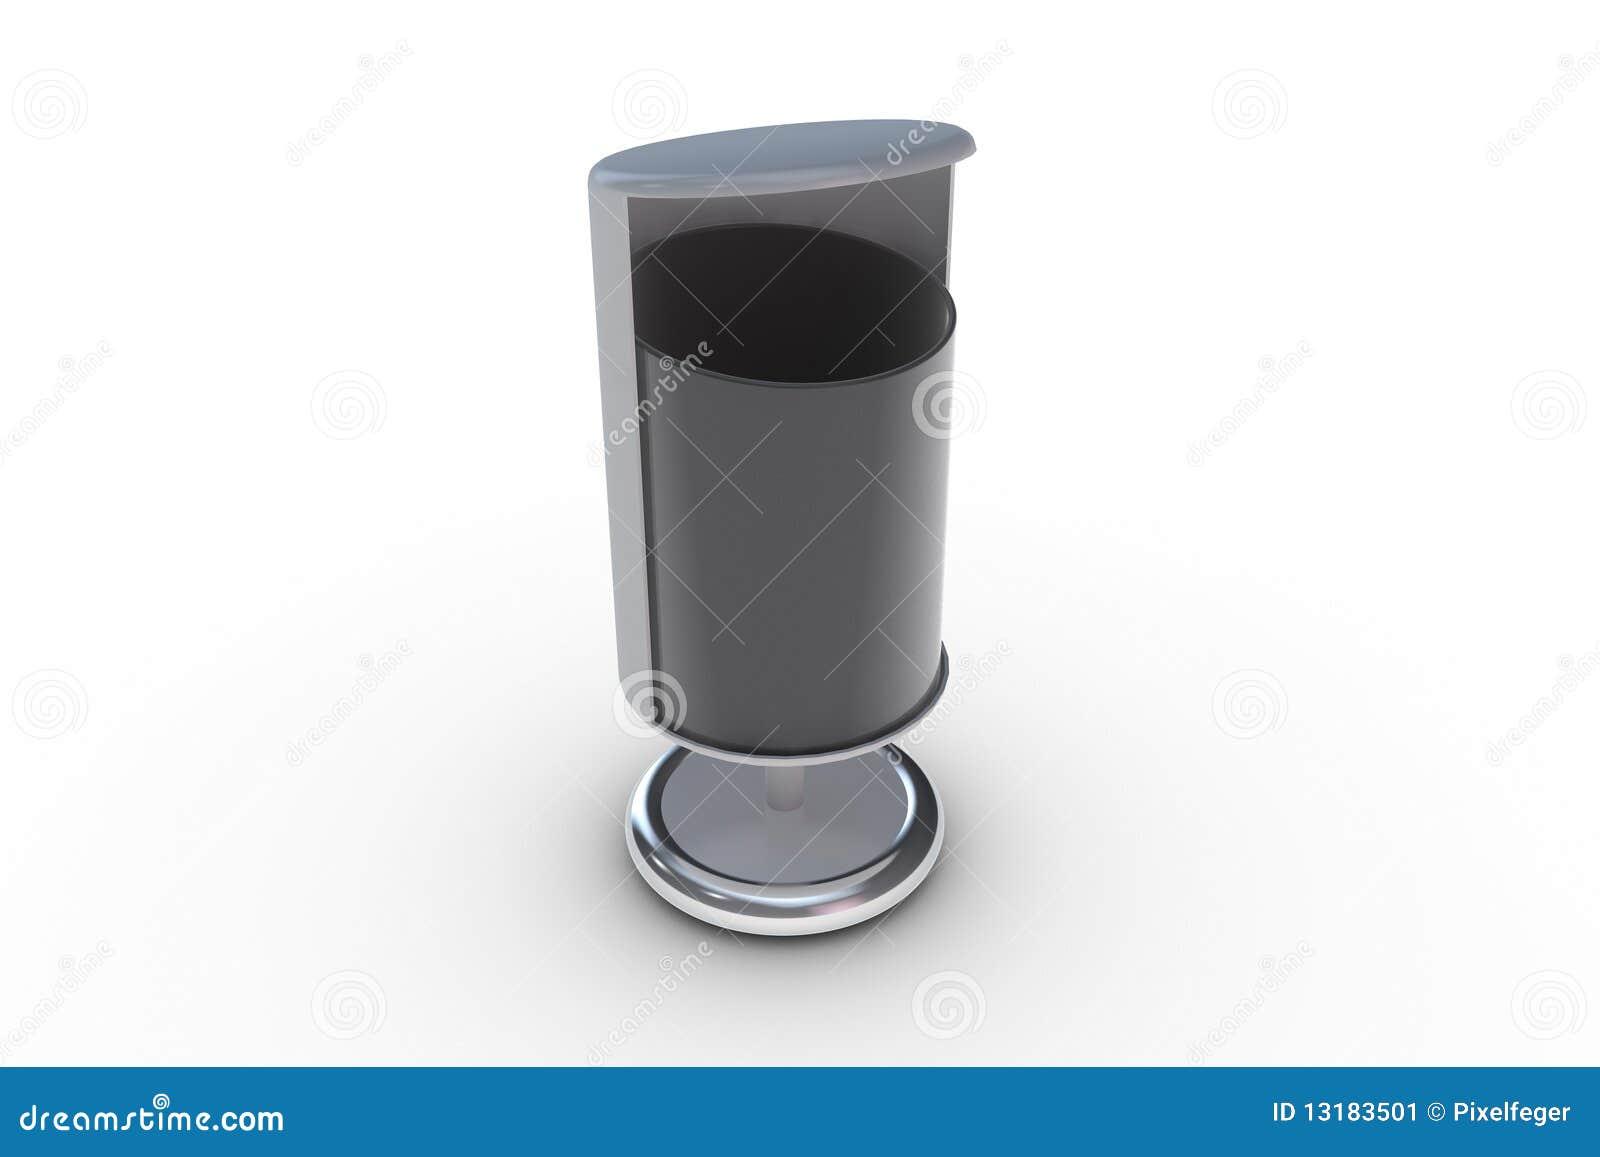 modern trash can stock image  image  - royaltyfree stock photo can trash